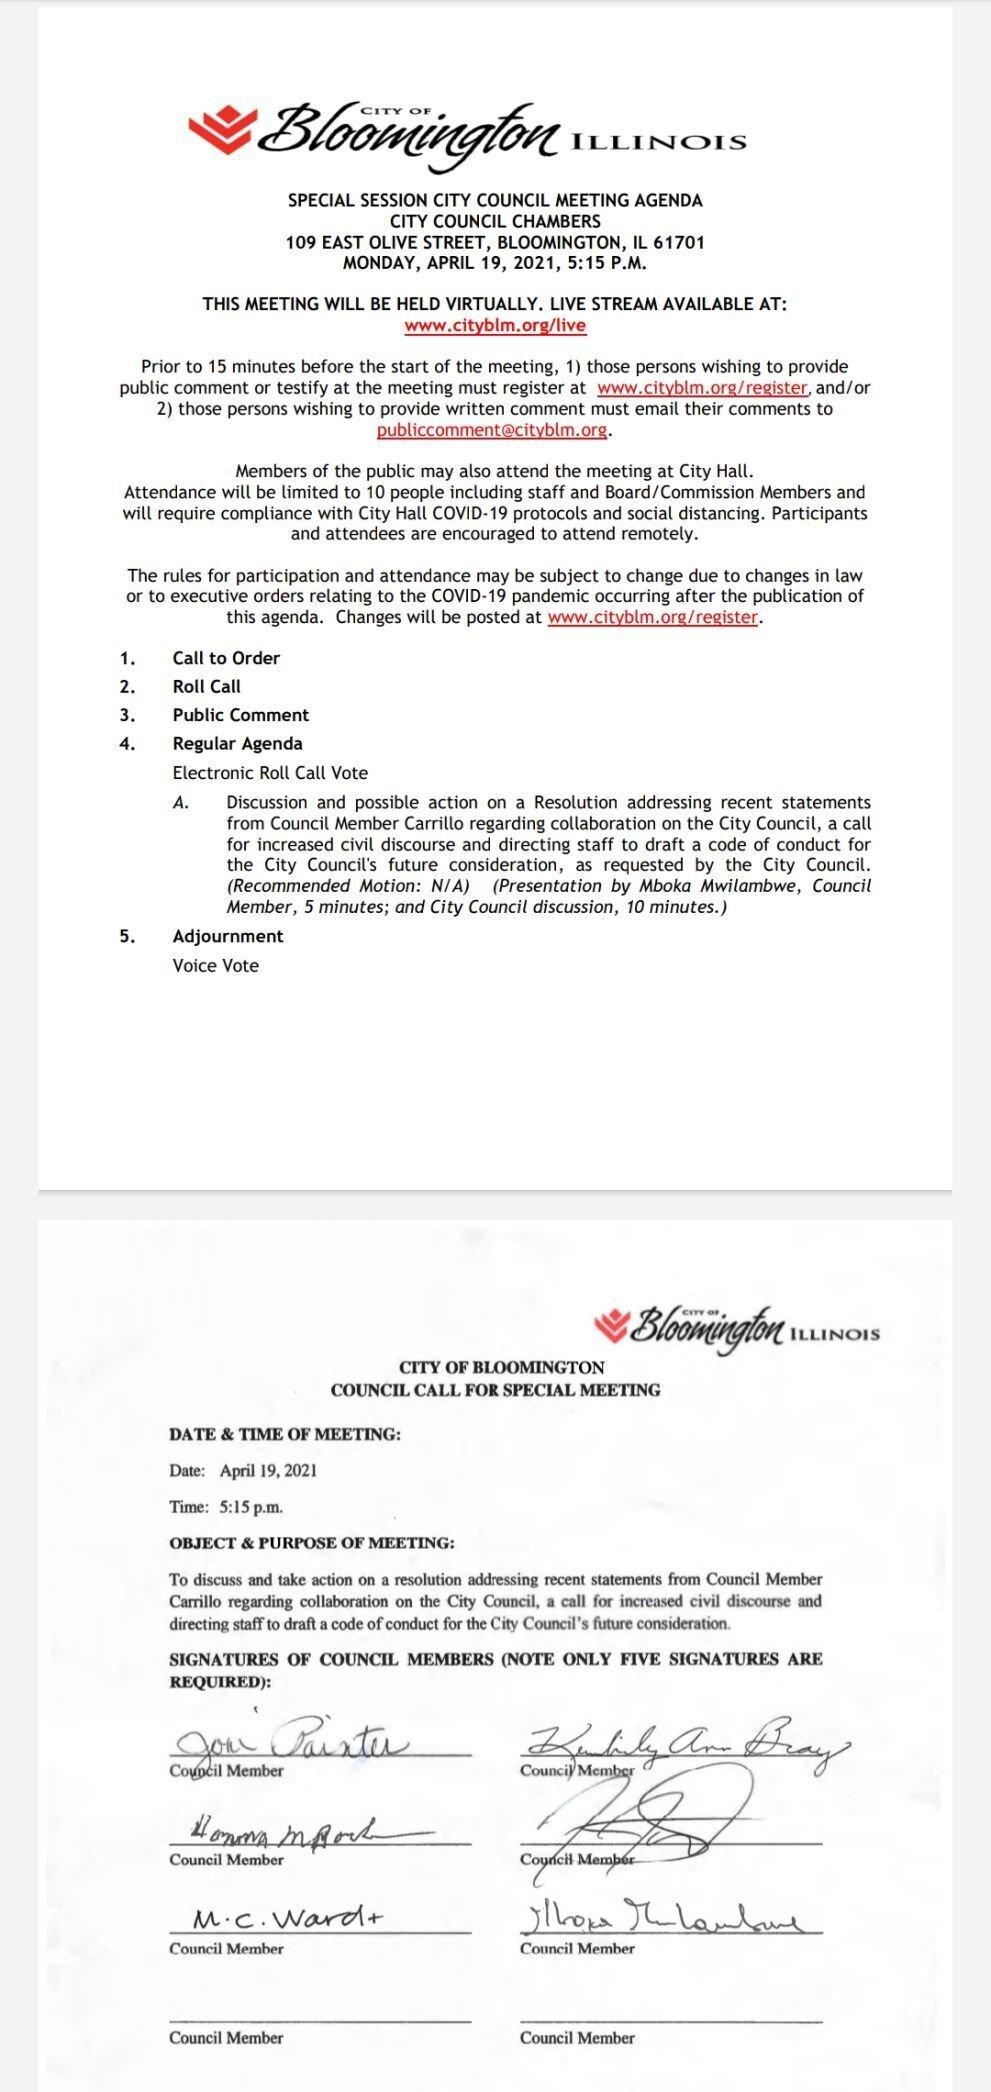 Bloomington City Council April 19, 2021 special session agenda